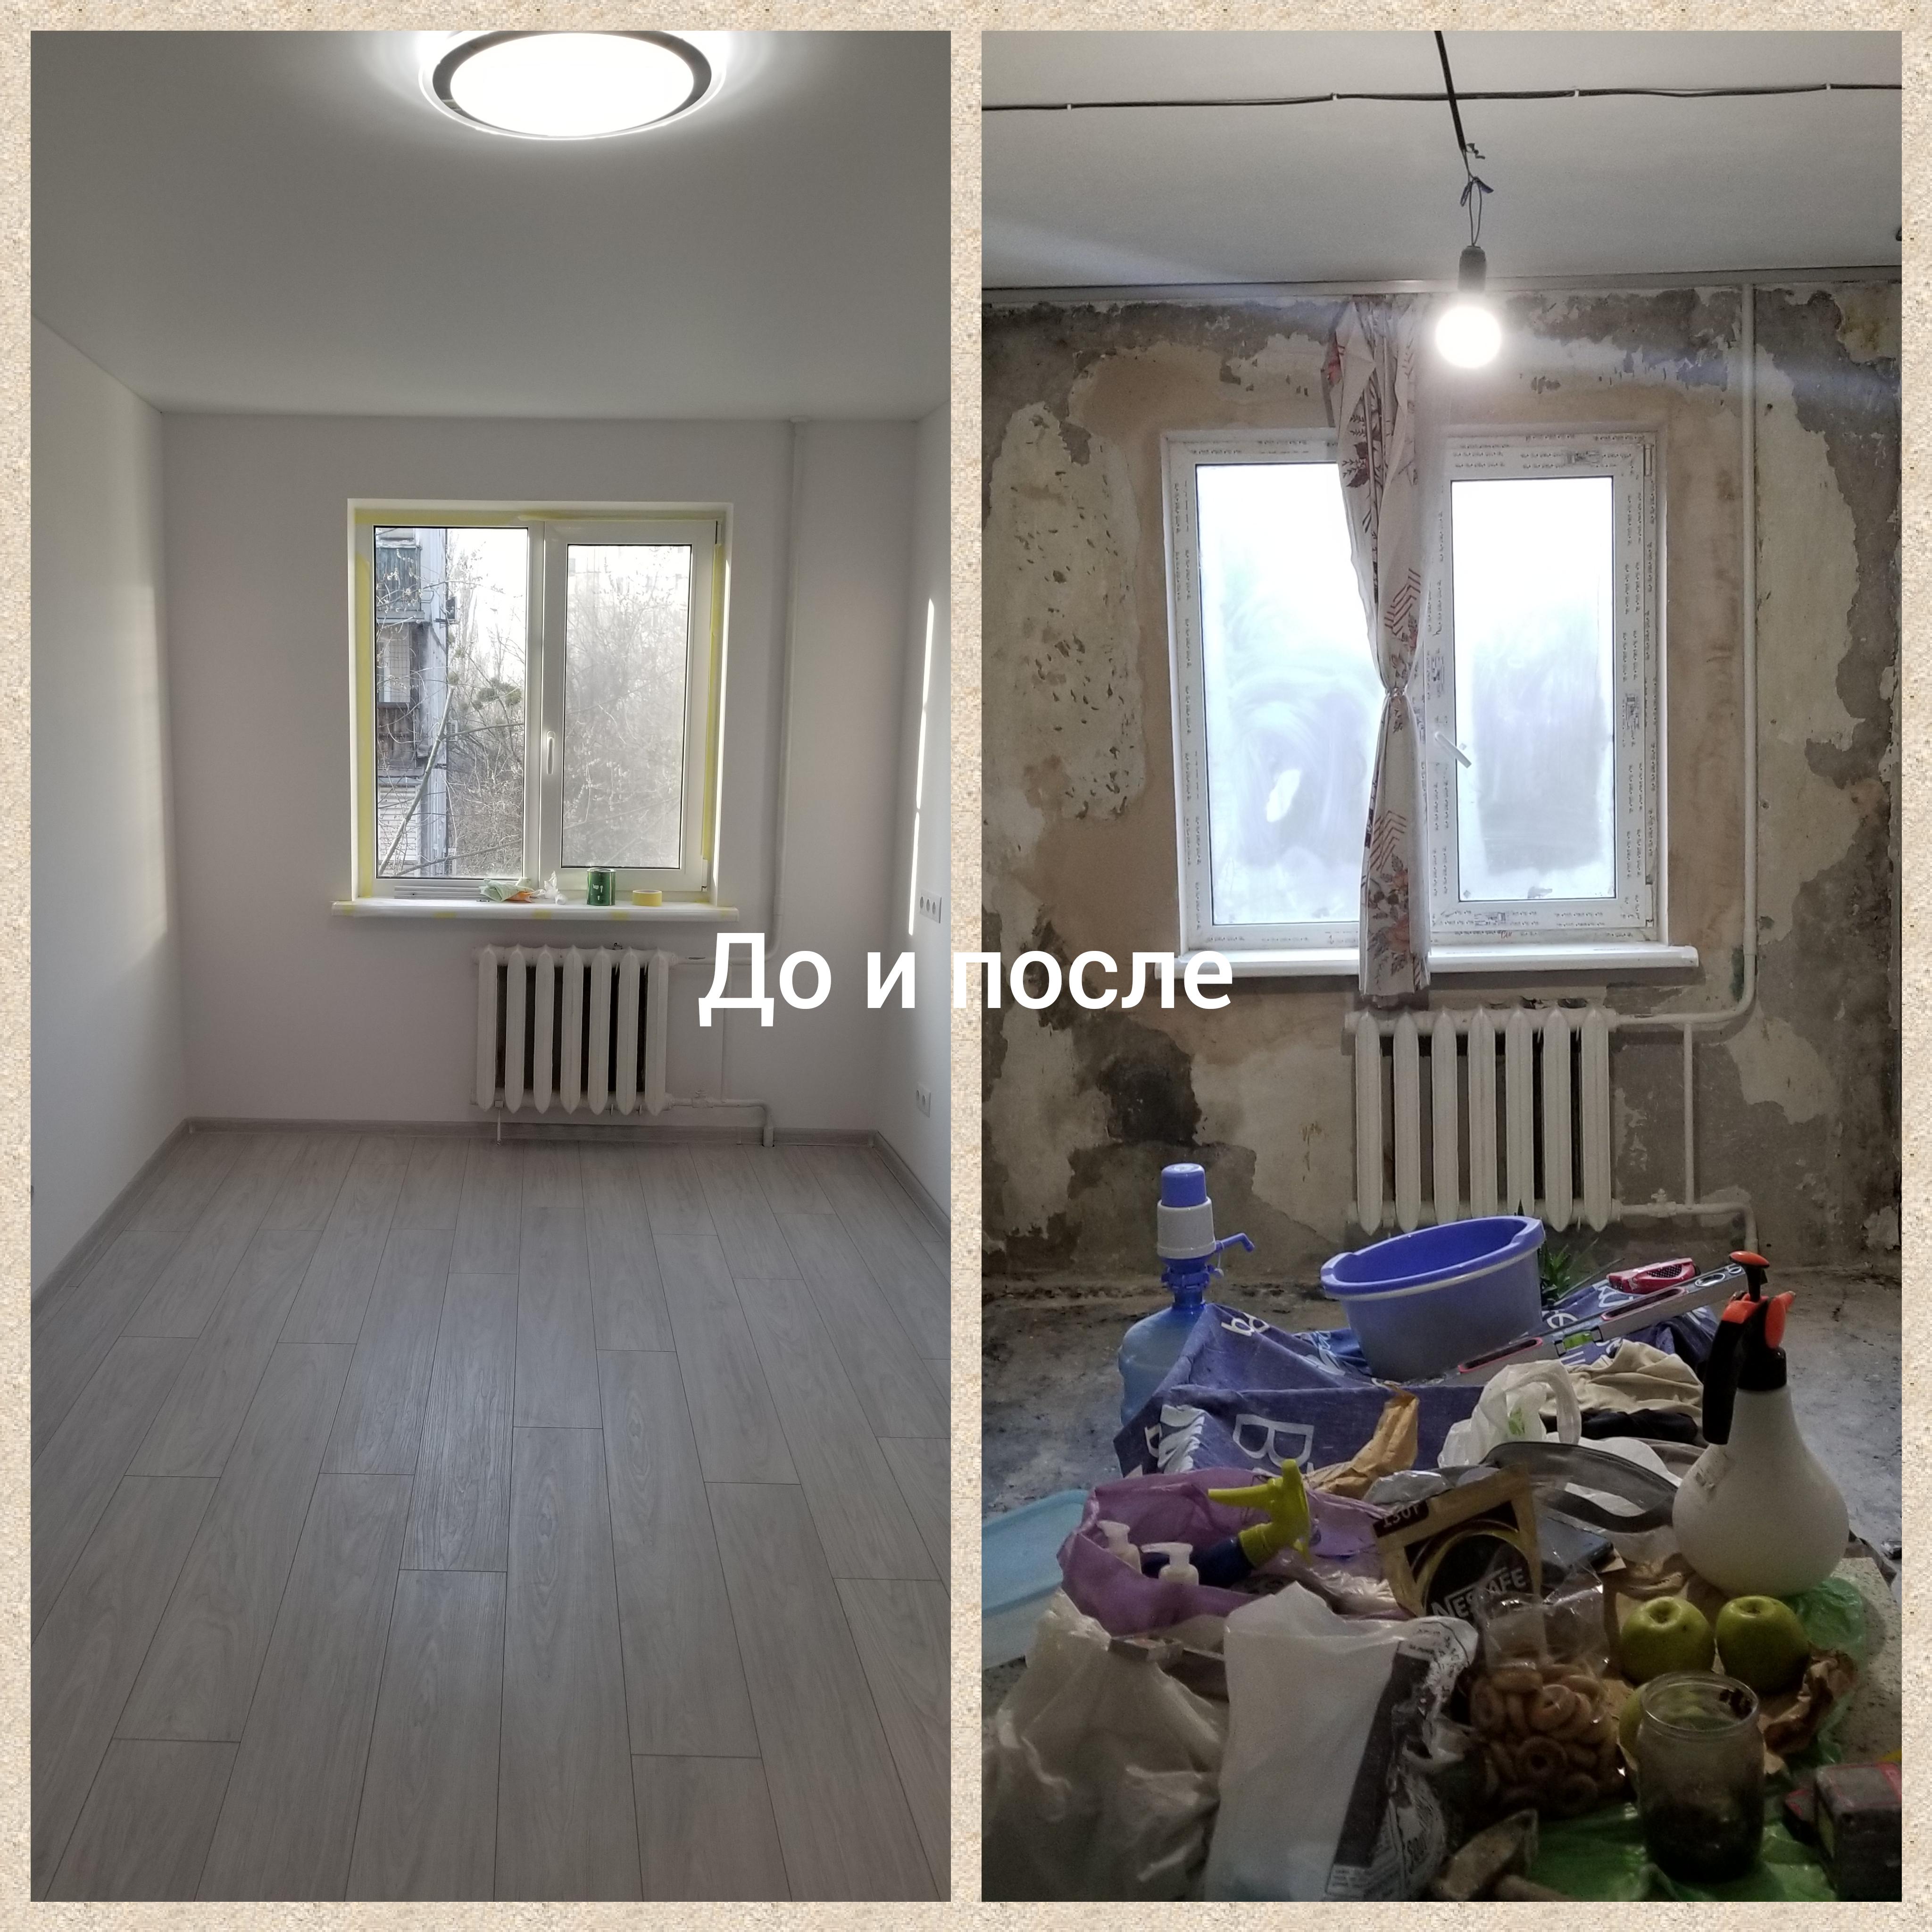 Фото Комната под ключ. Выравнивание стен, пола, штукатурка, Откосы, шпатлевка, ламинат, обои